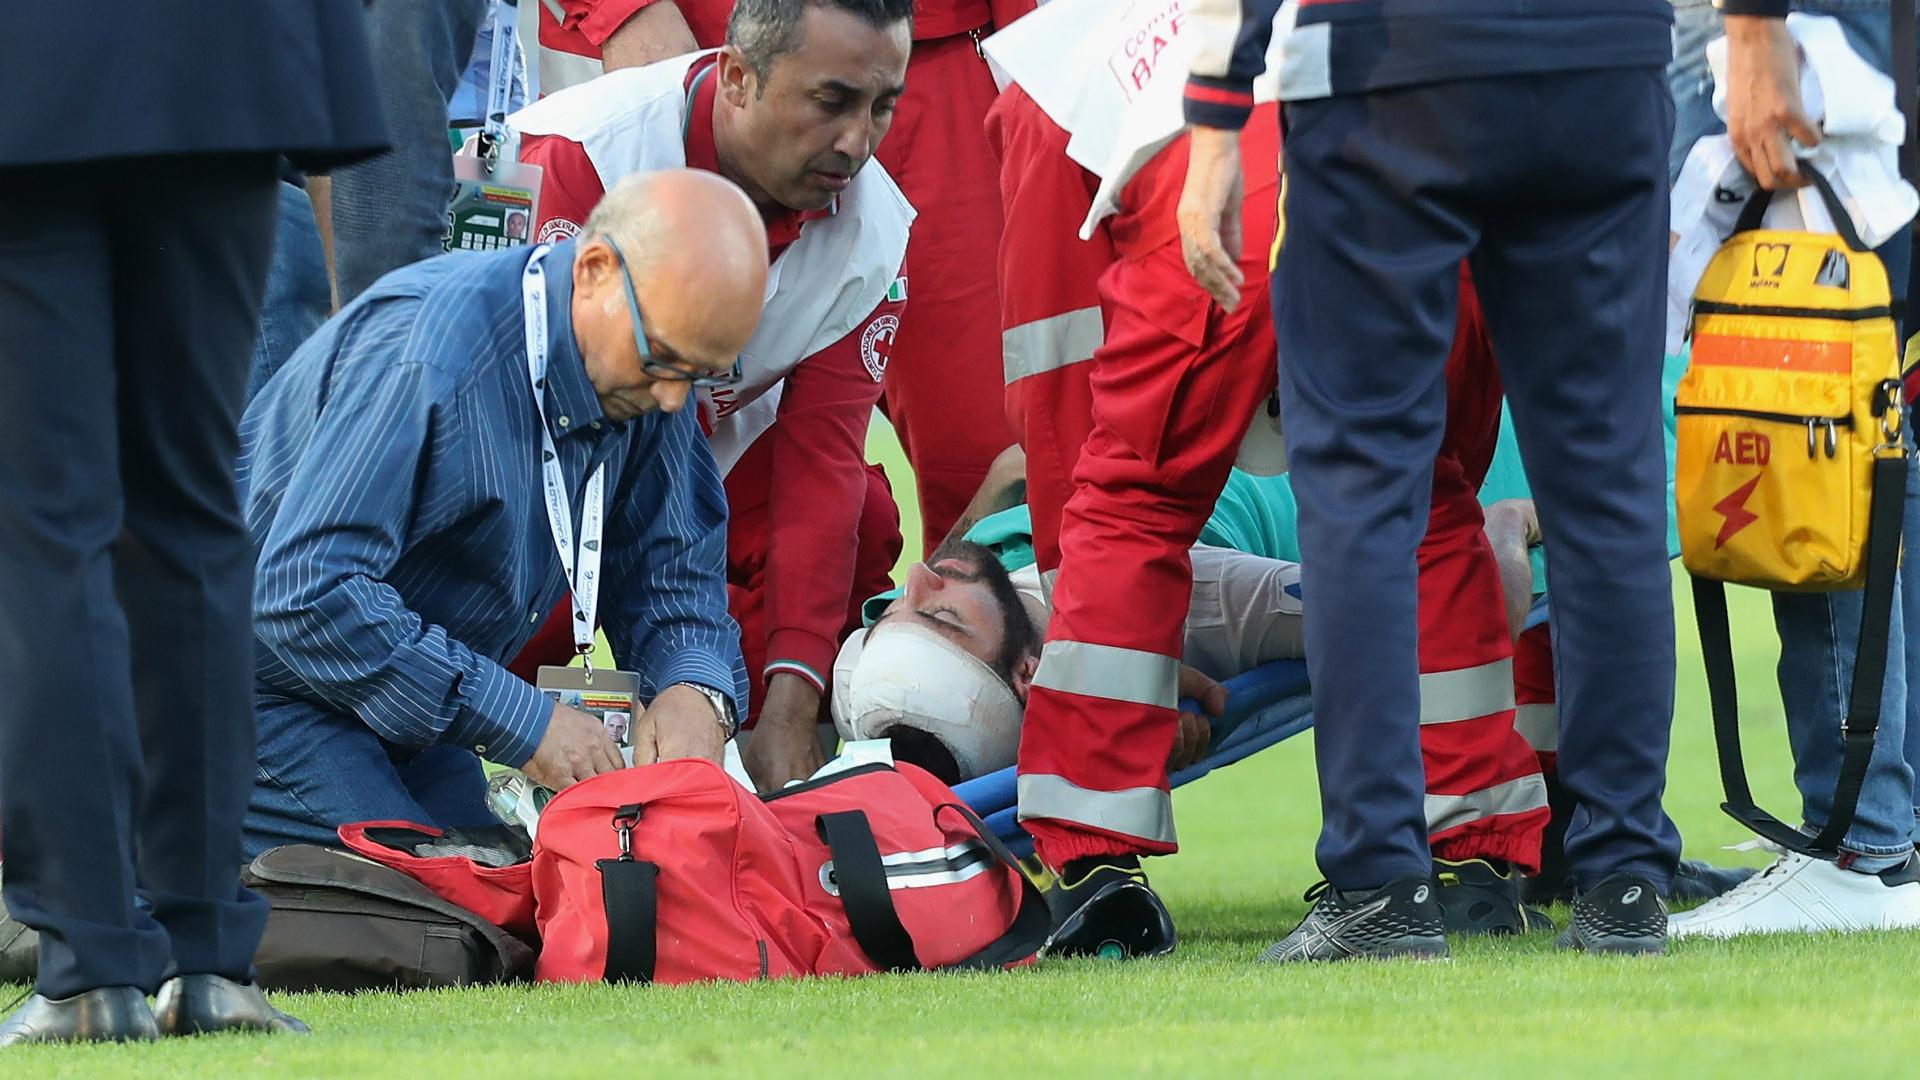 Higuain conscious and alert after heavy head knock, Sarri confirms